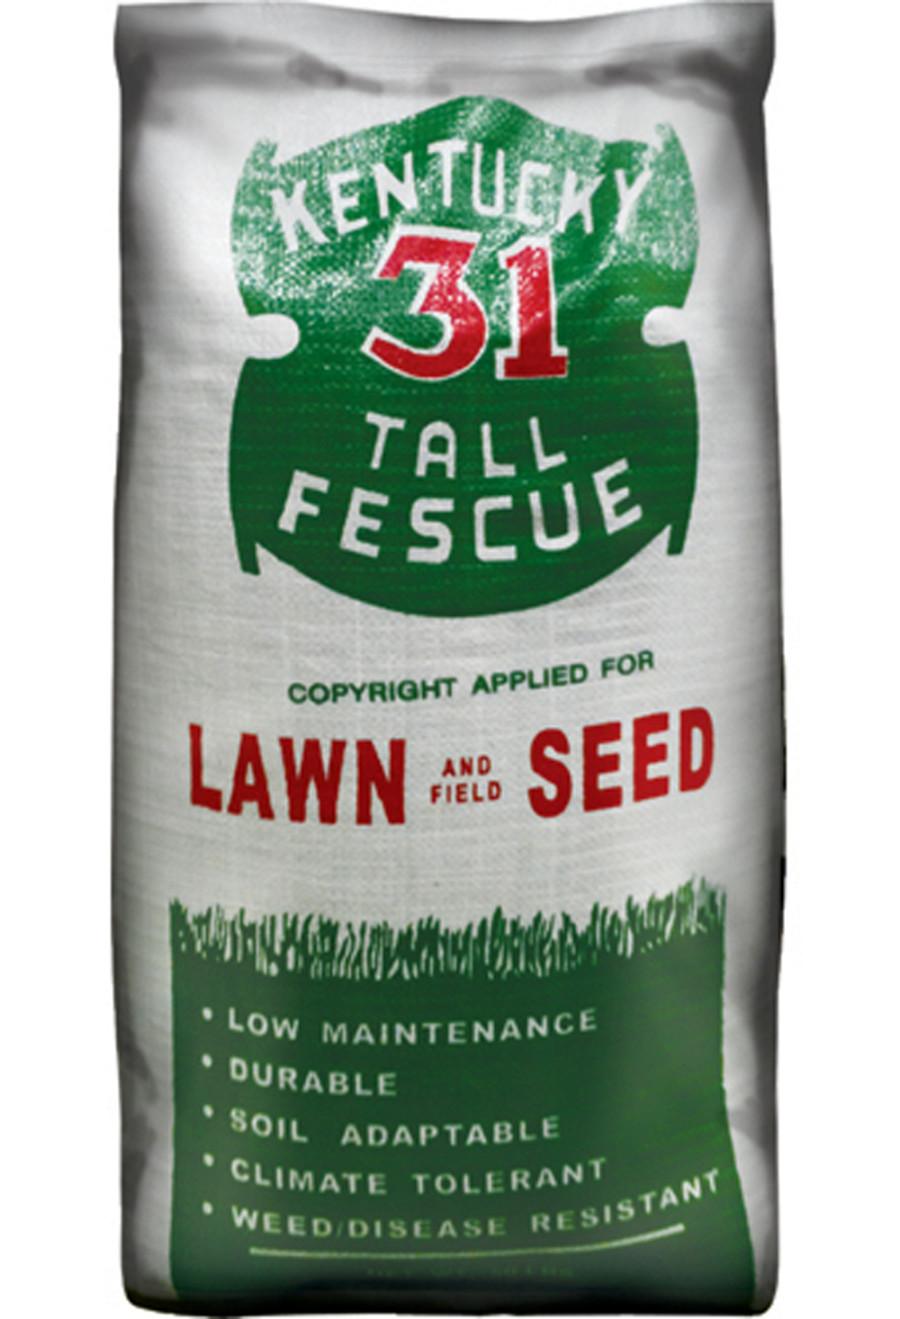 Pennington Tall Fescue KY 31 95% Pure 1ea/50 lb